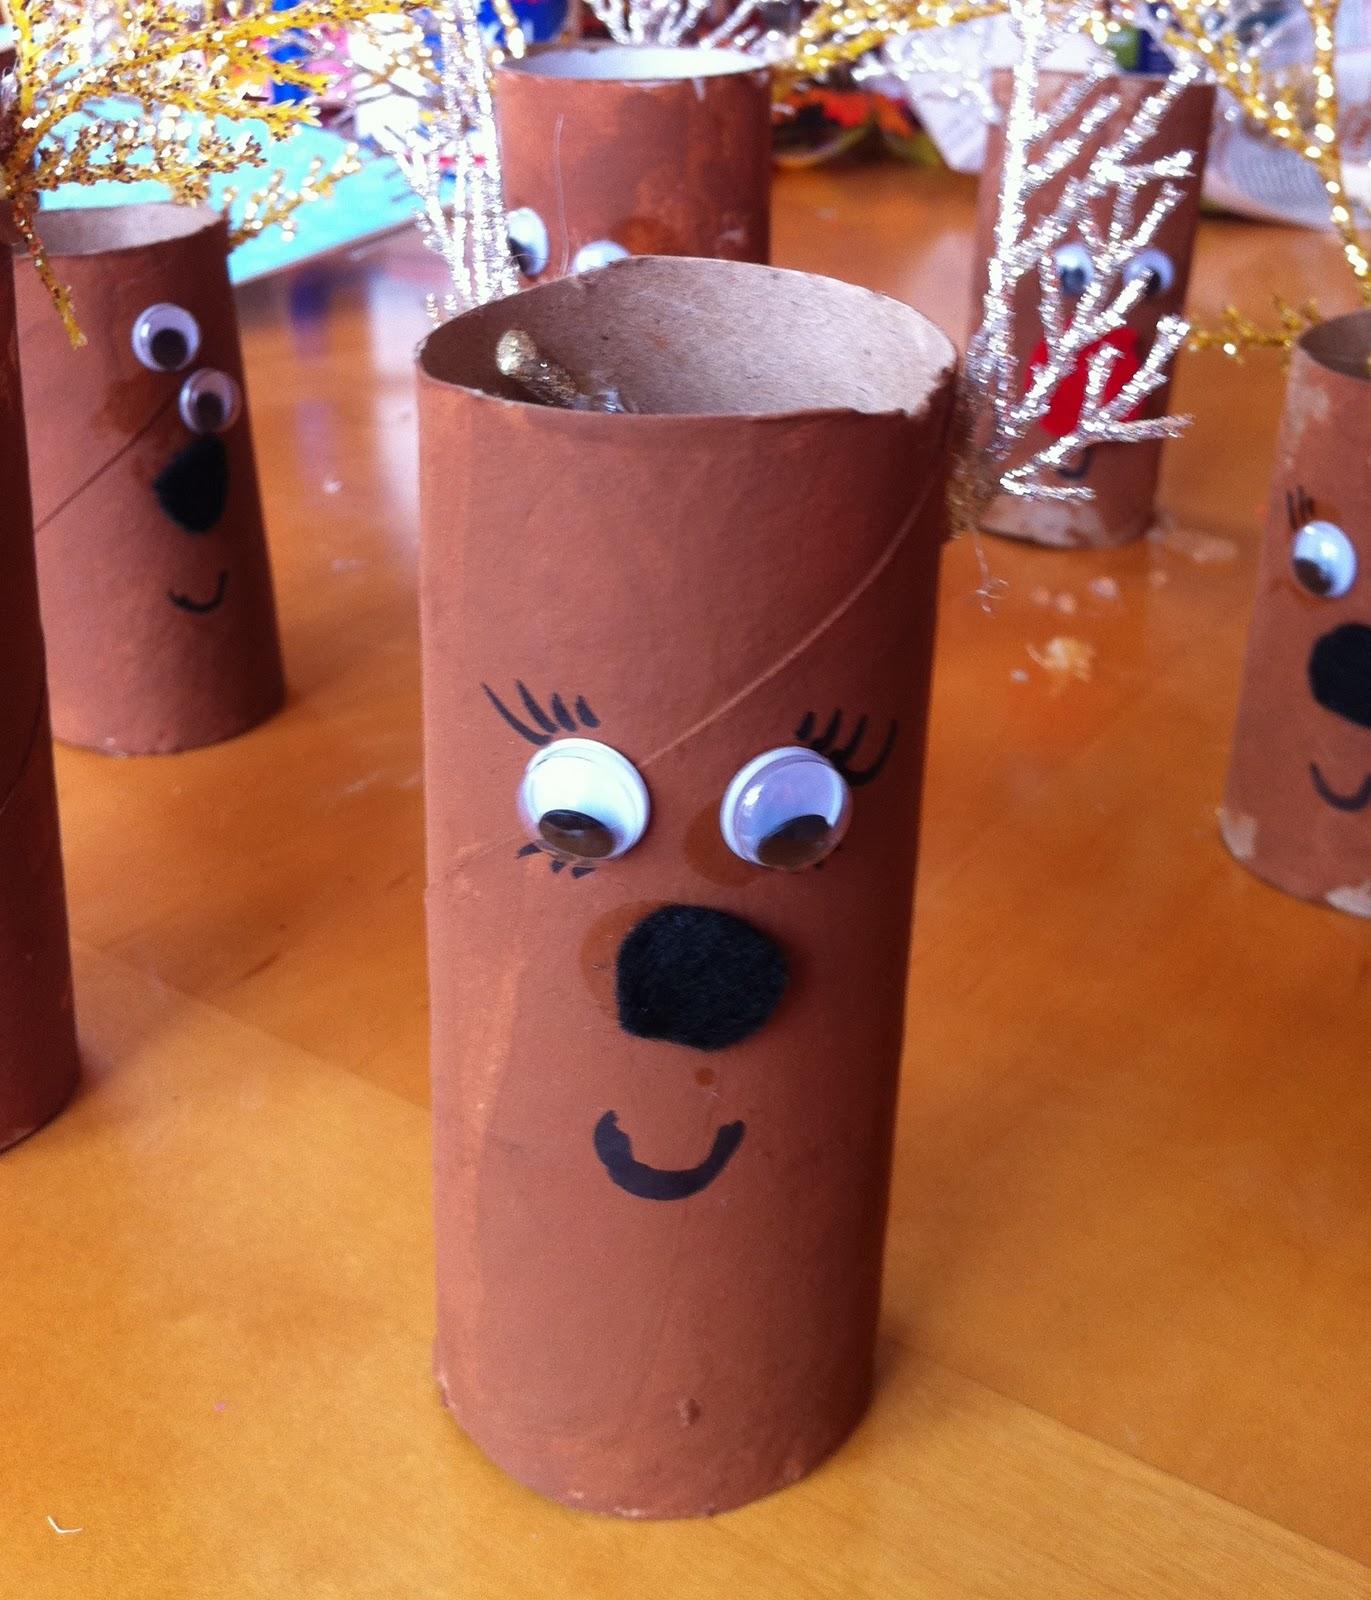 Kinda like a turtle toilet paper roll reindeer craft for little kids